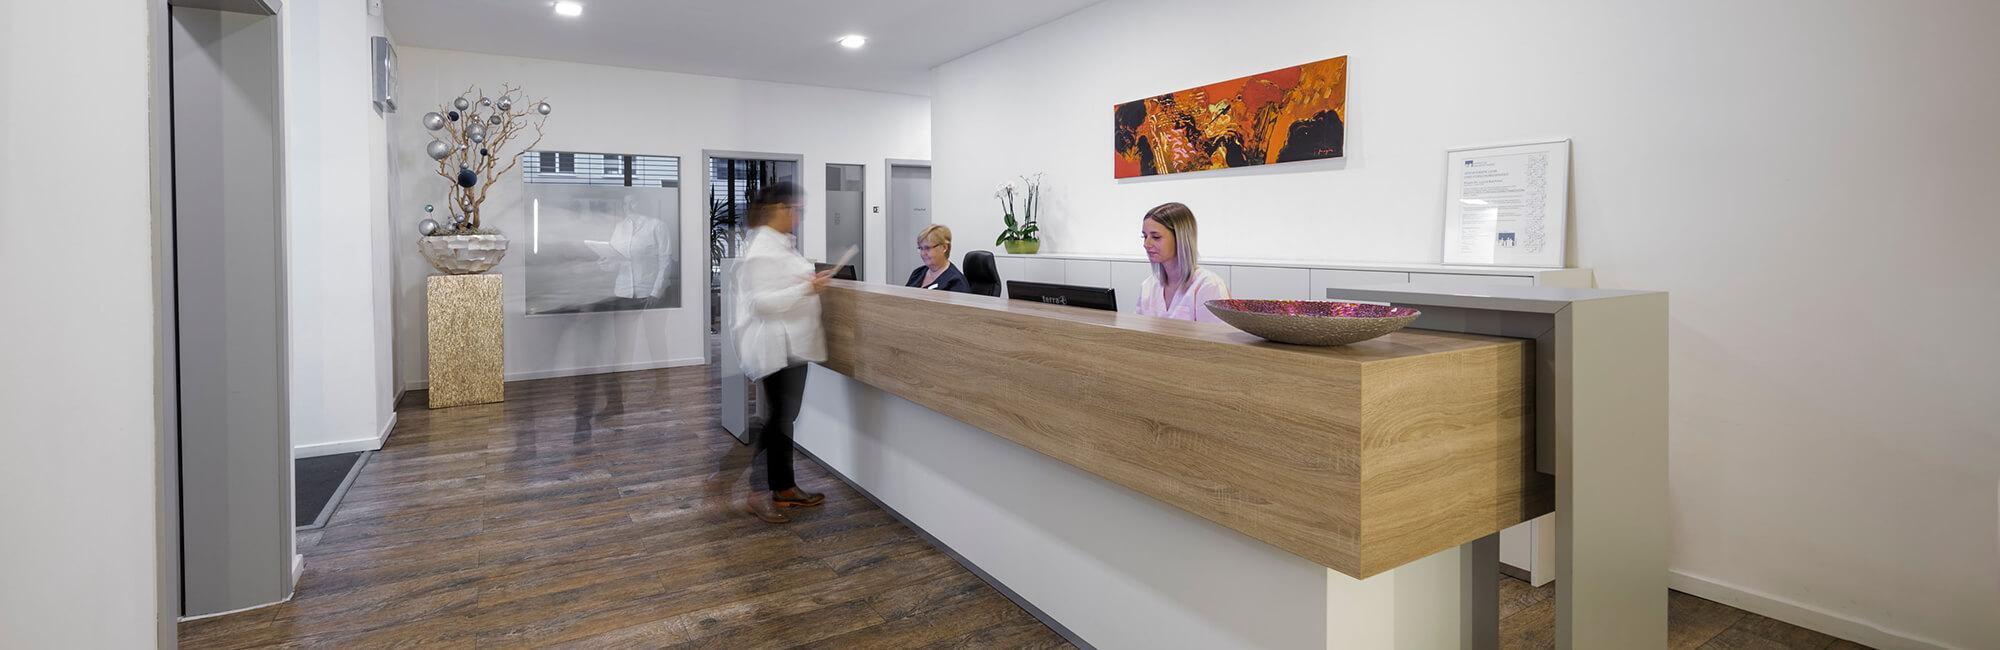 Hausarzt Köln Innenstadt - Dr. Lucia Bachner - am Empfang der Praxis - Kontakt